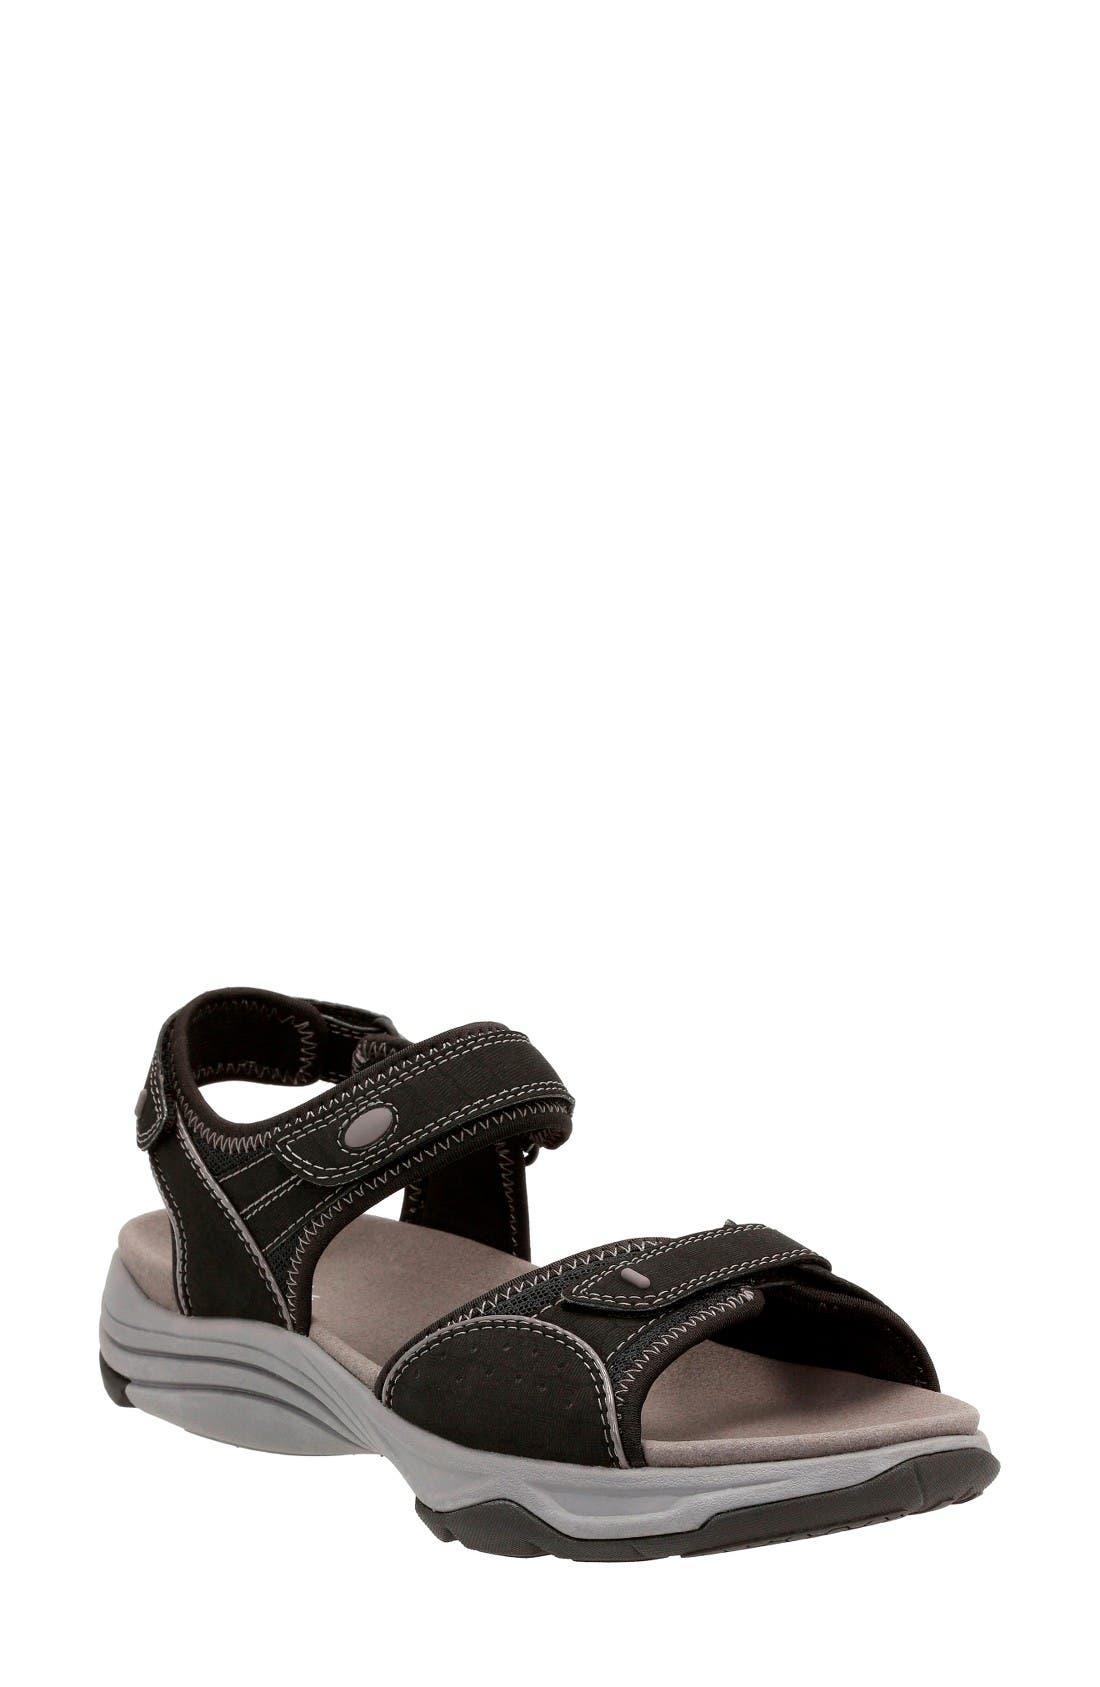 Main Image - Clarks® Wave Grip Sandal (Women)